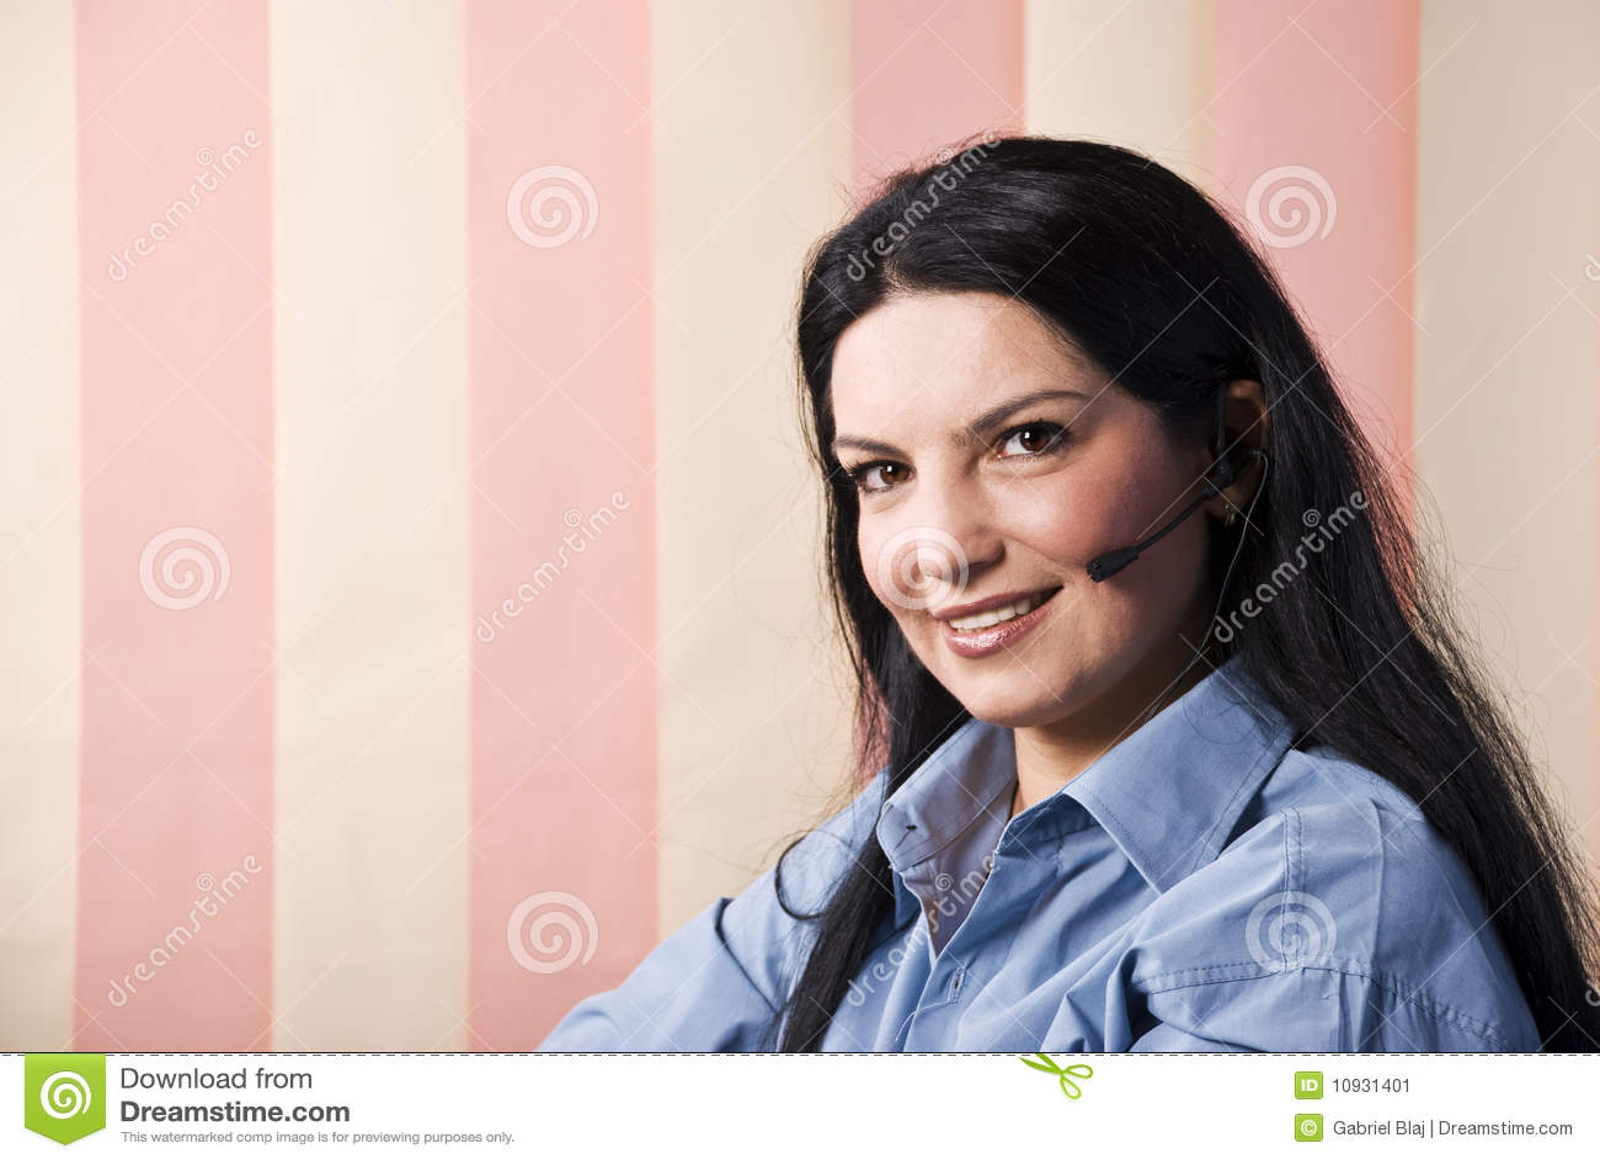 Happy Smile Customer Service Rep Stock Image